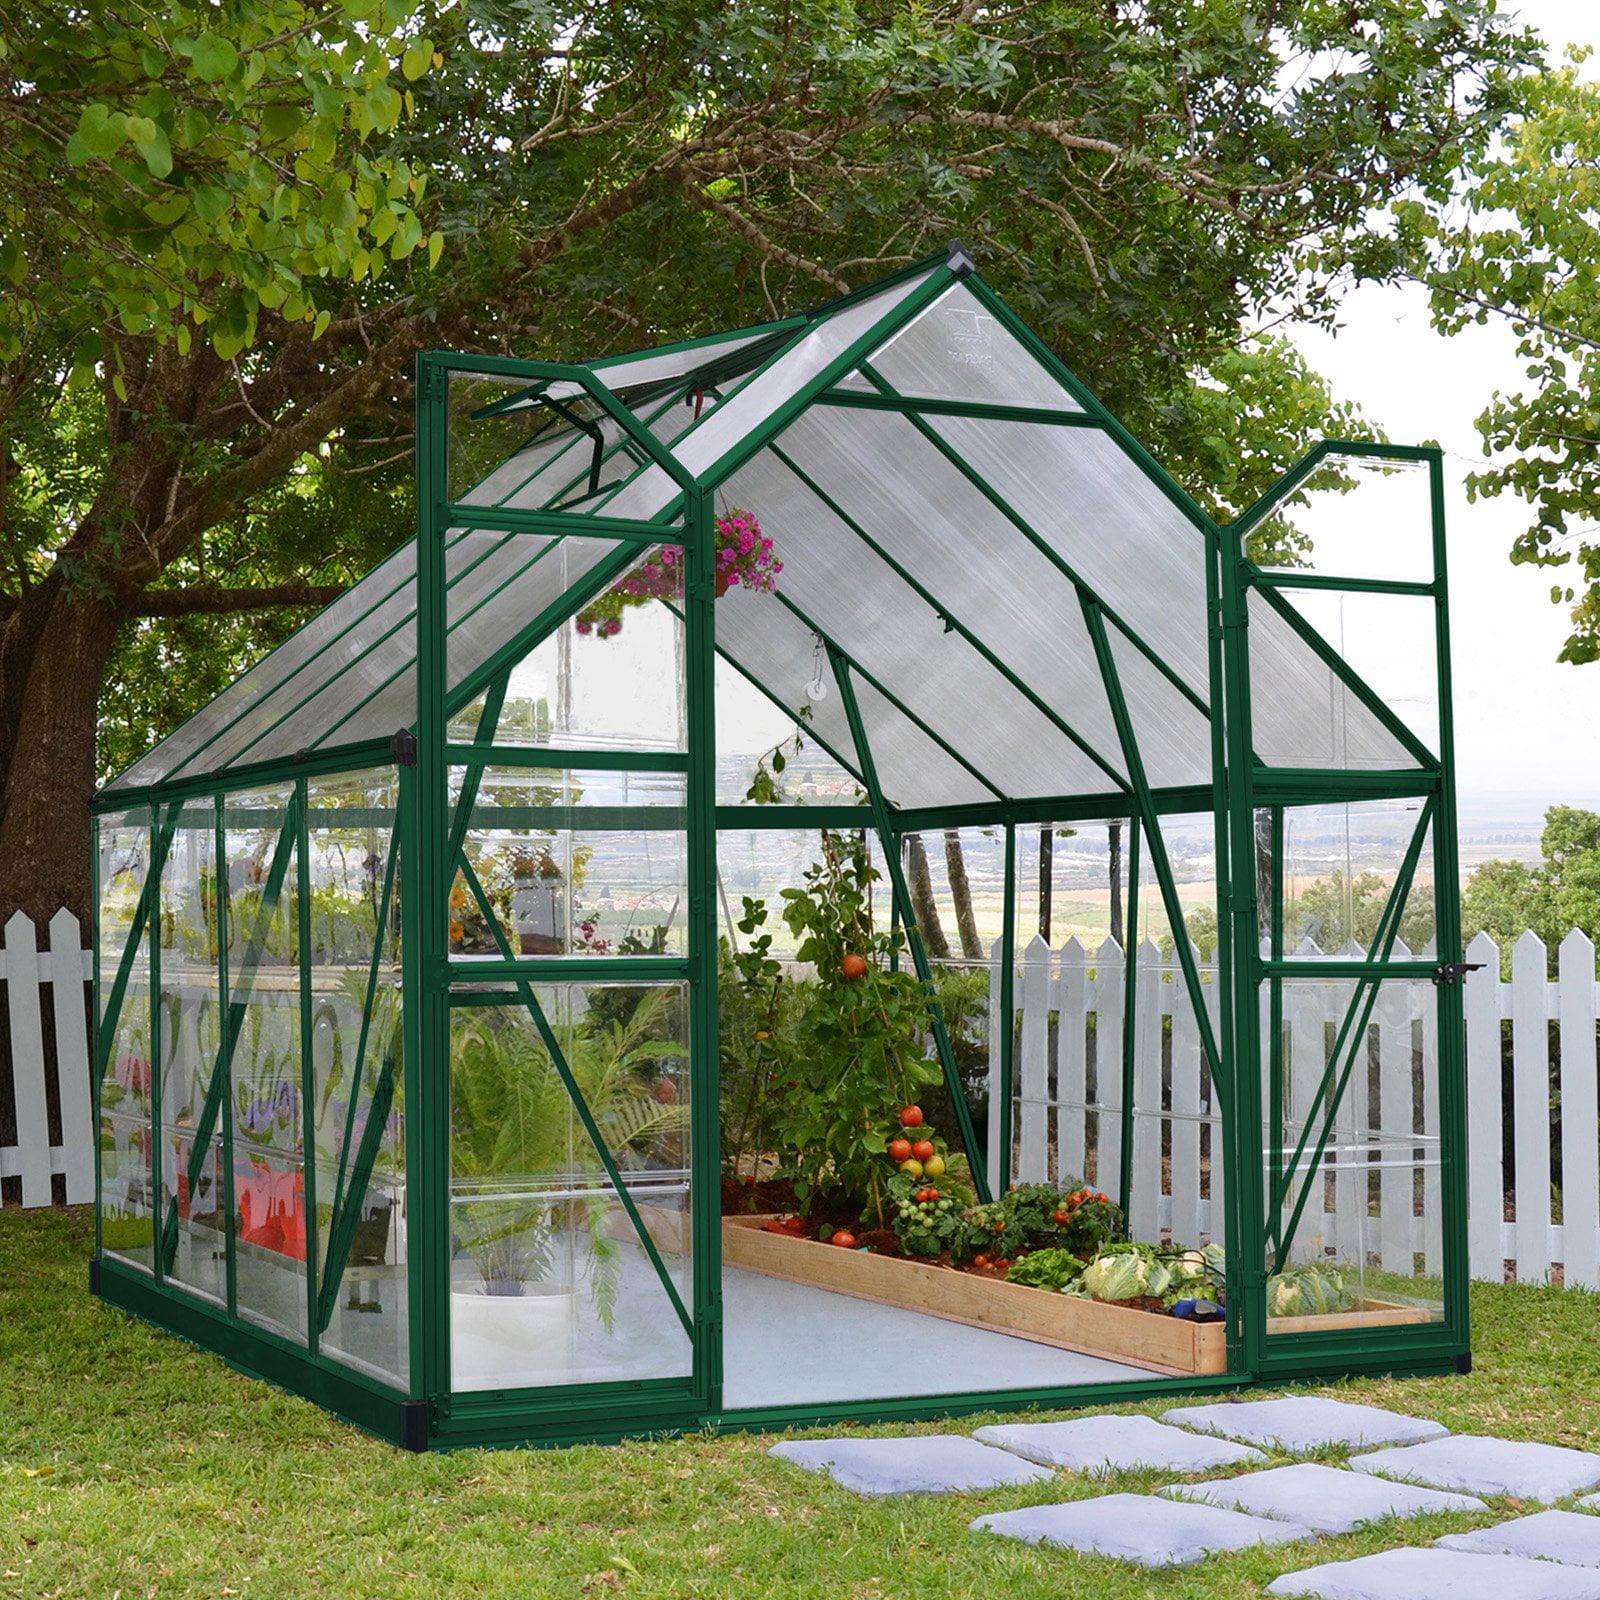 Green Balance 8' x 8' Greenhouse by Palram